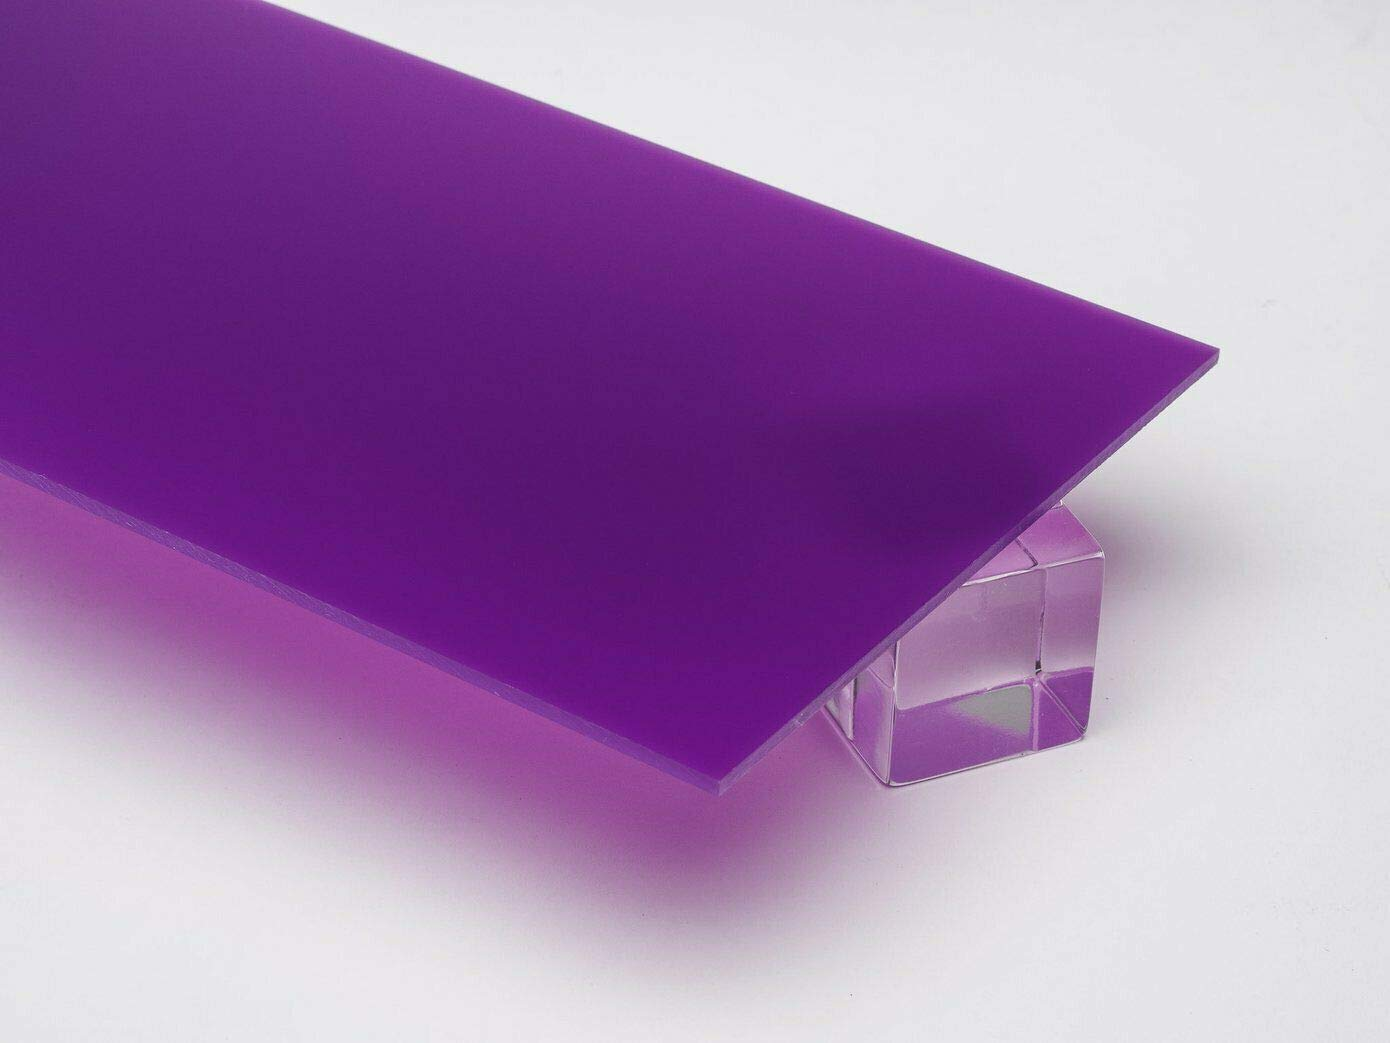 Parma Violet Perspex® Acrylic Sweet Pastel Sheet A5 A4 A3 3mm Thick SA 7562